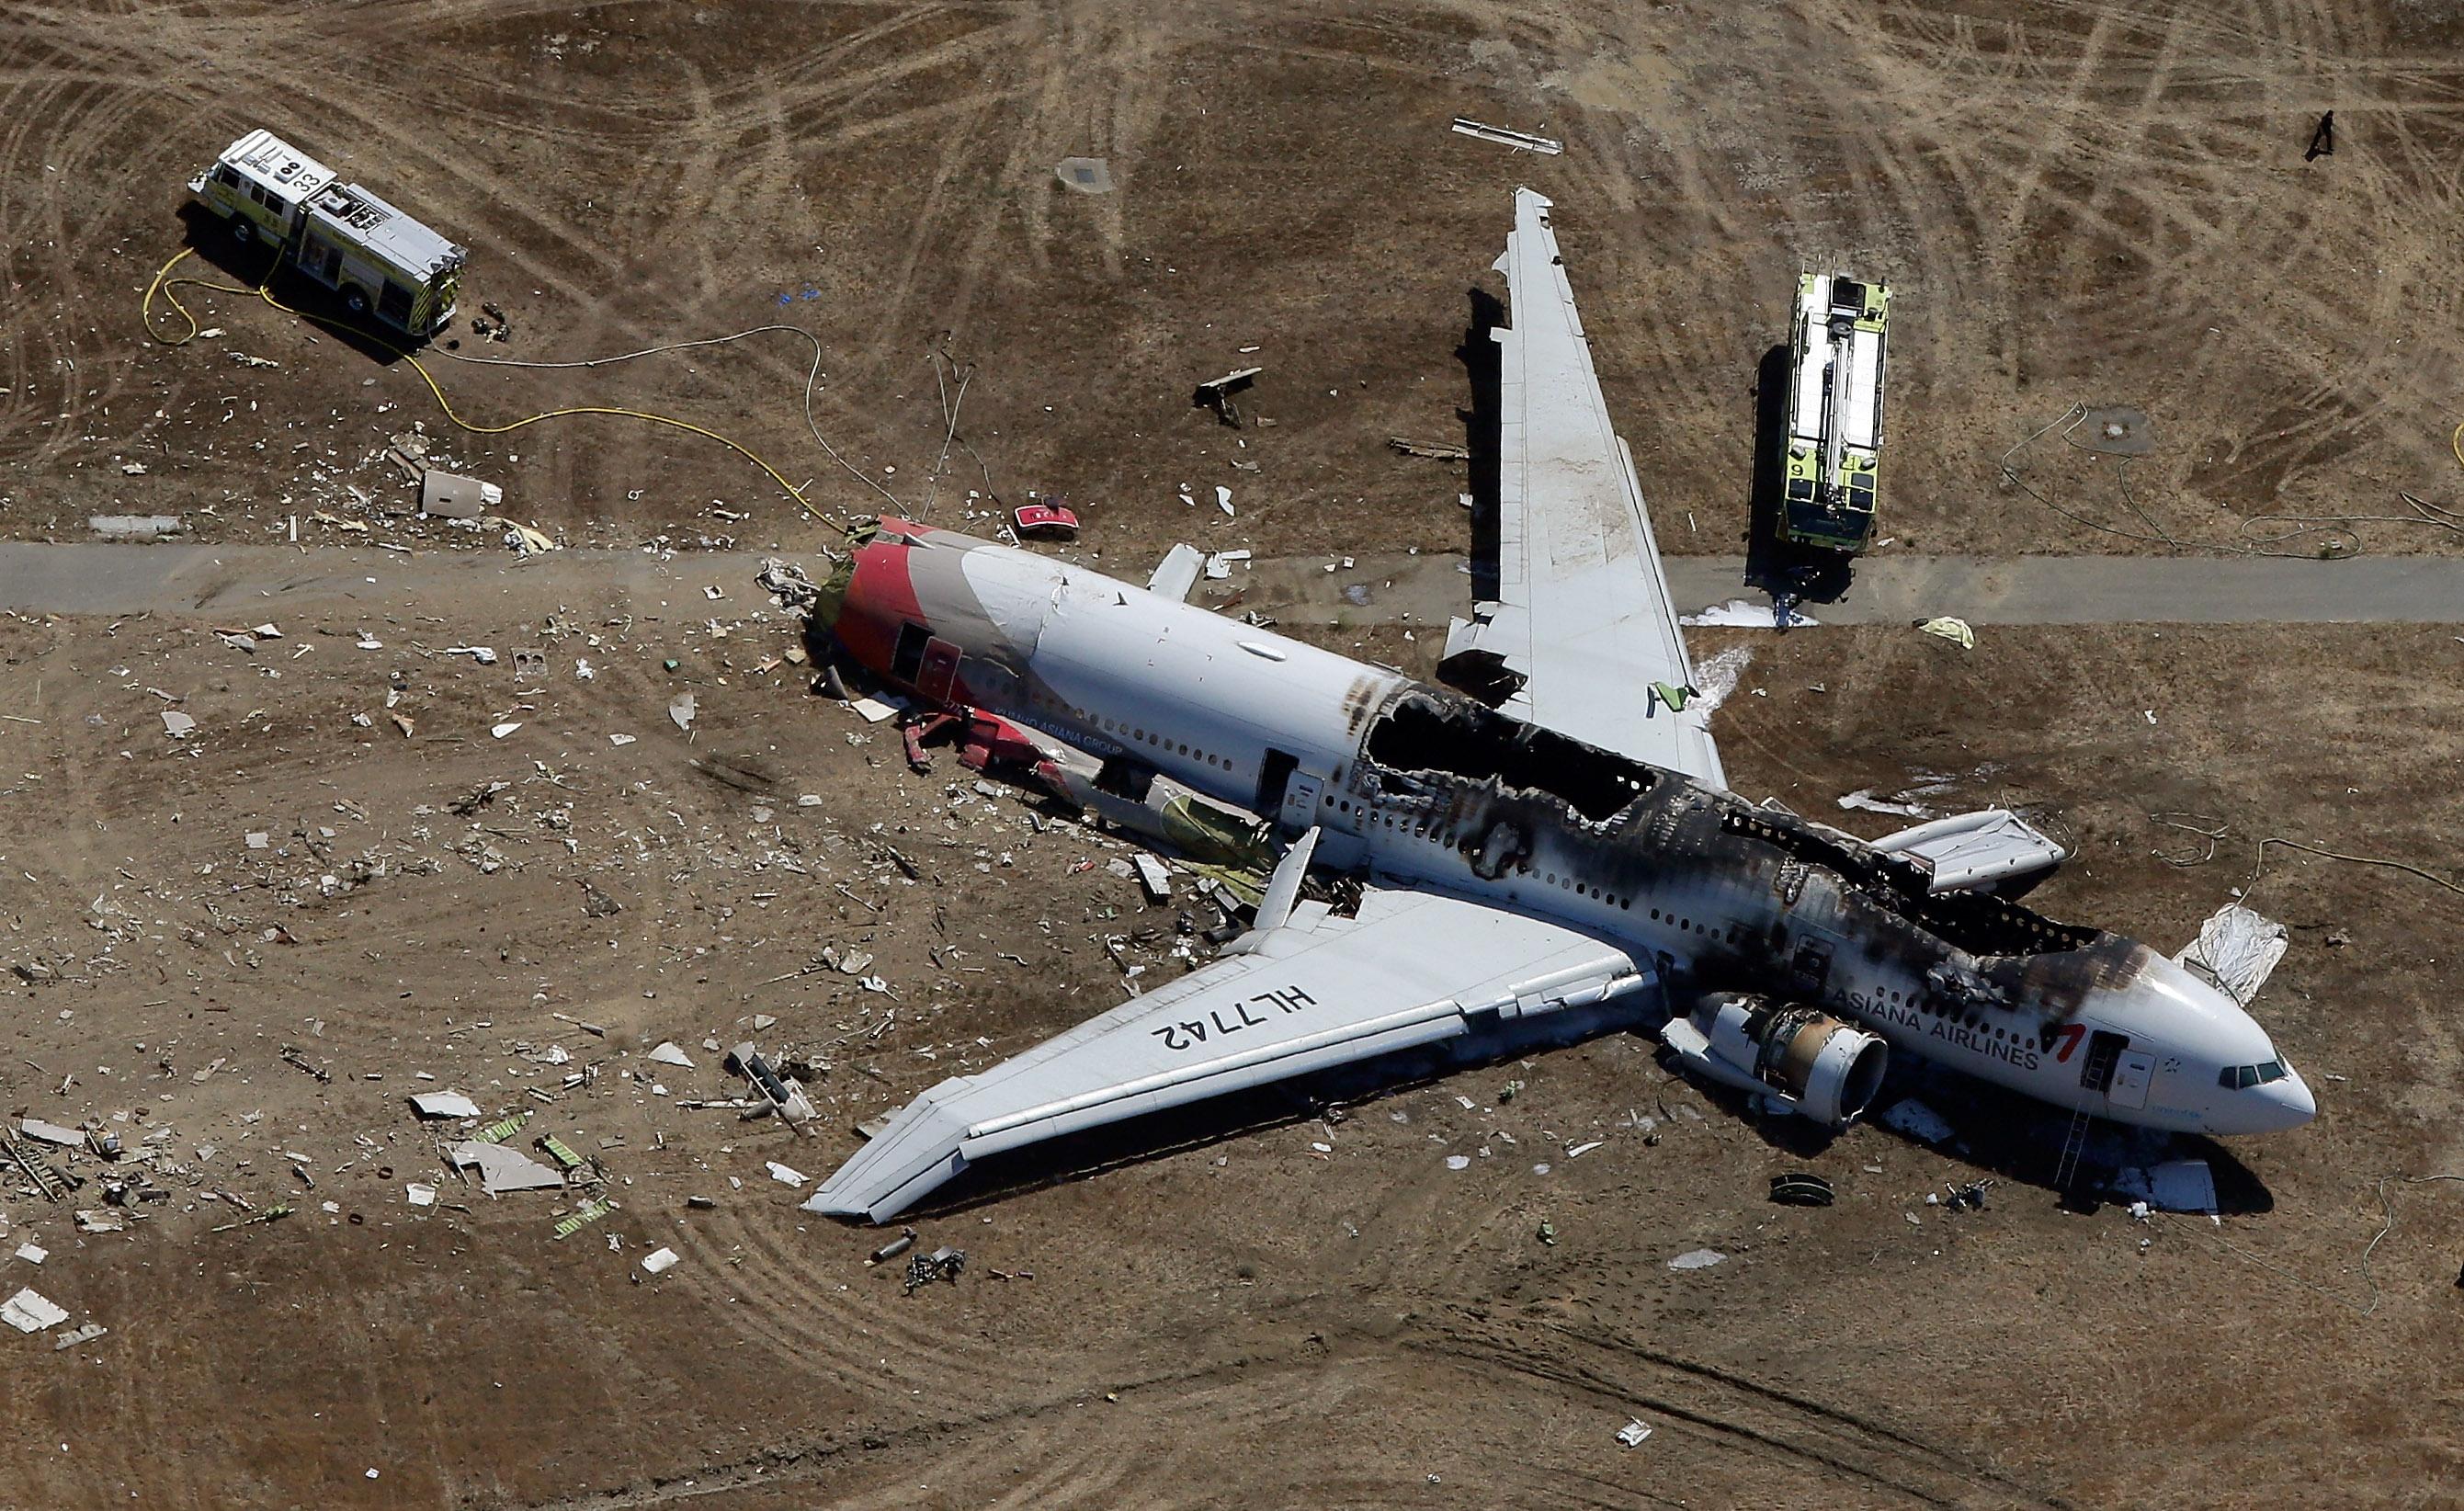 Airplane crash amateur video — 1